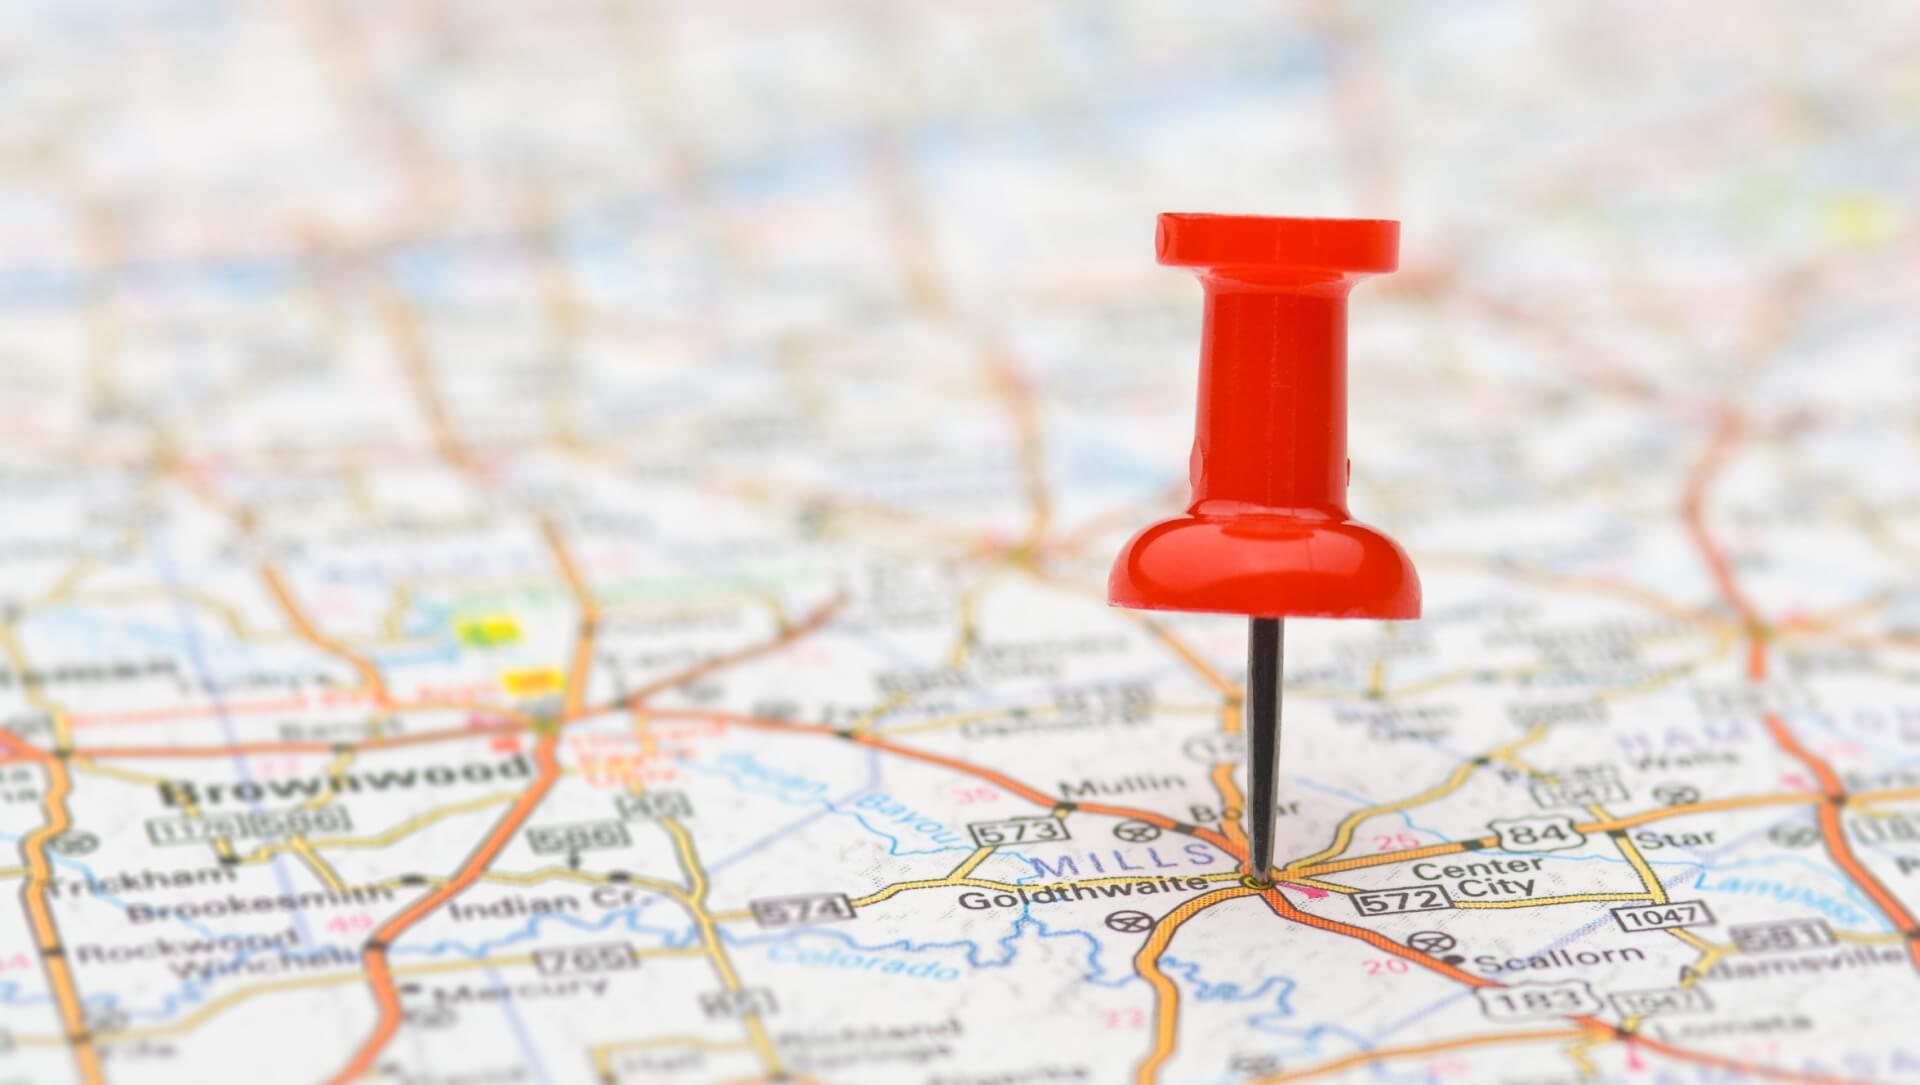 Deciding Where to Live - The Incorvaia Team